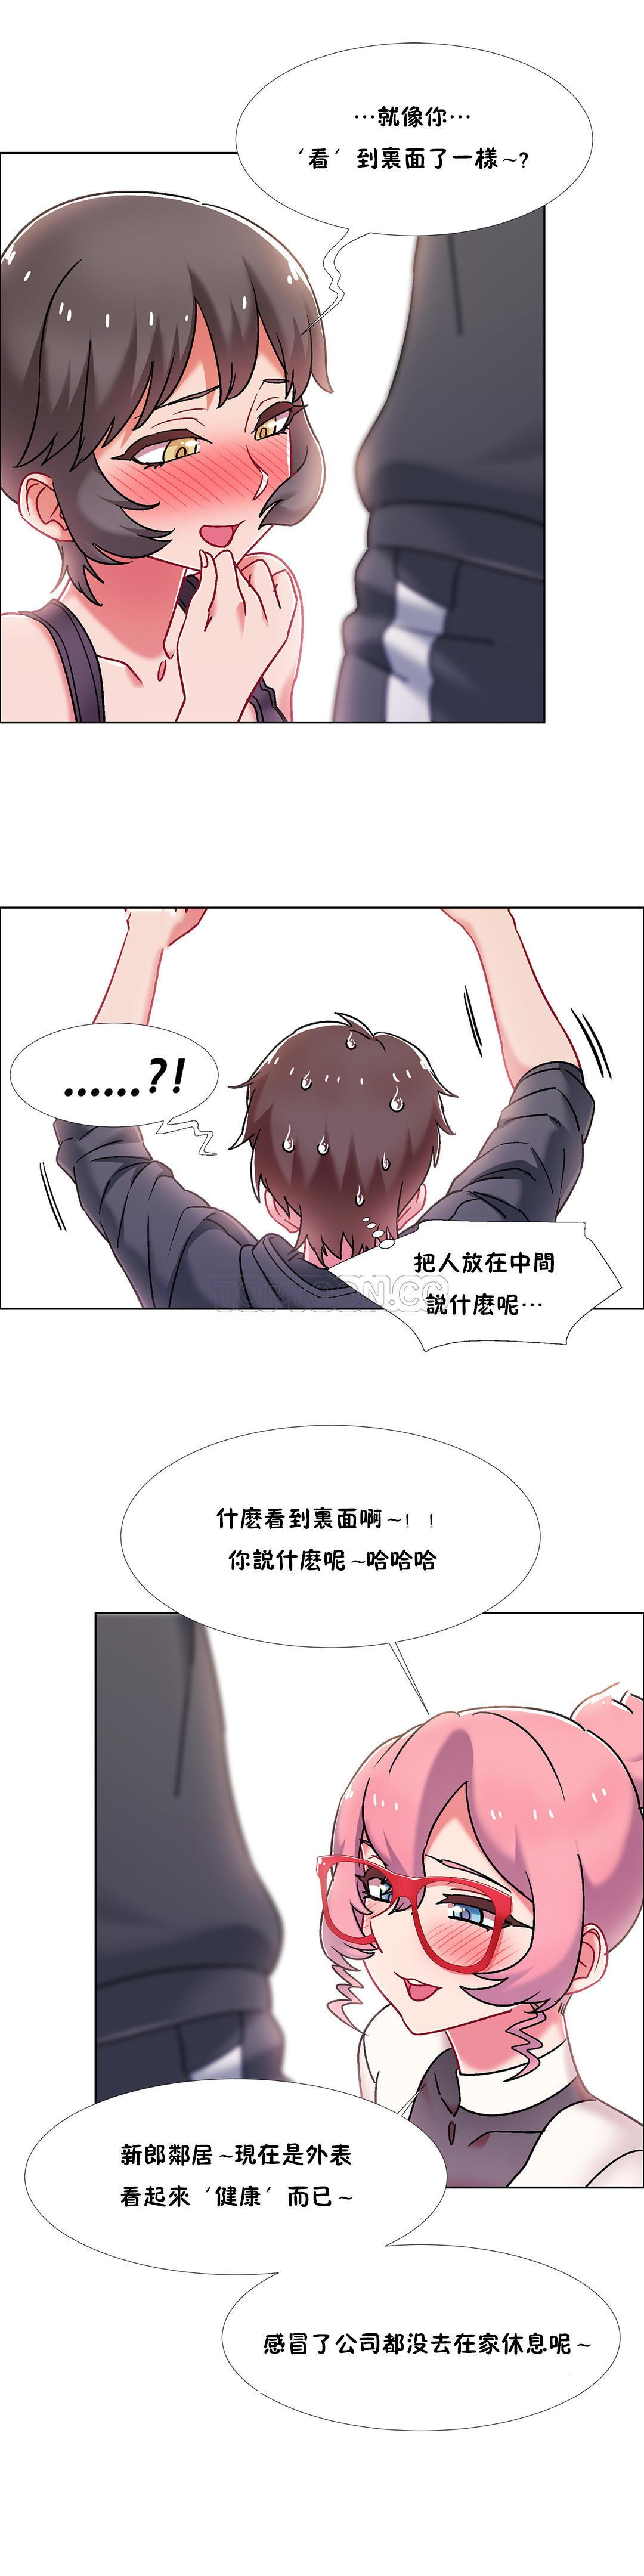 [Studio Wannabe] Rental Girls | 出租女郎 Ch. 33-58 [Chinese]  第二季 完结 317